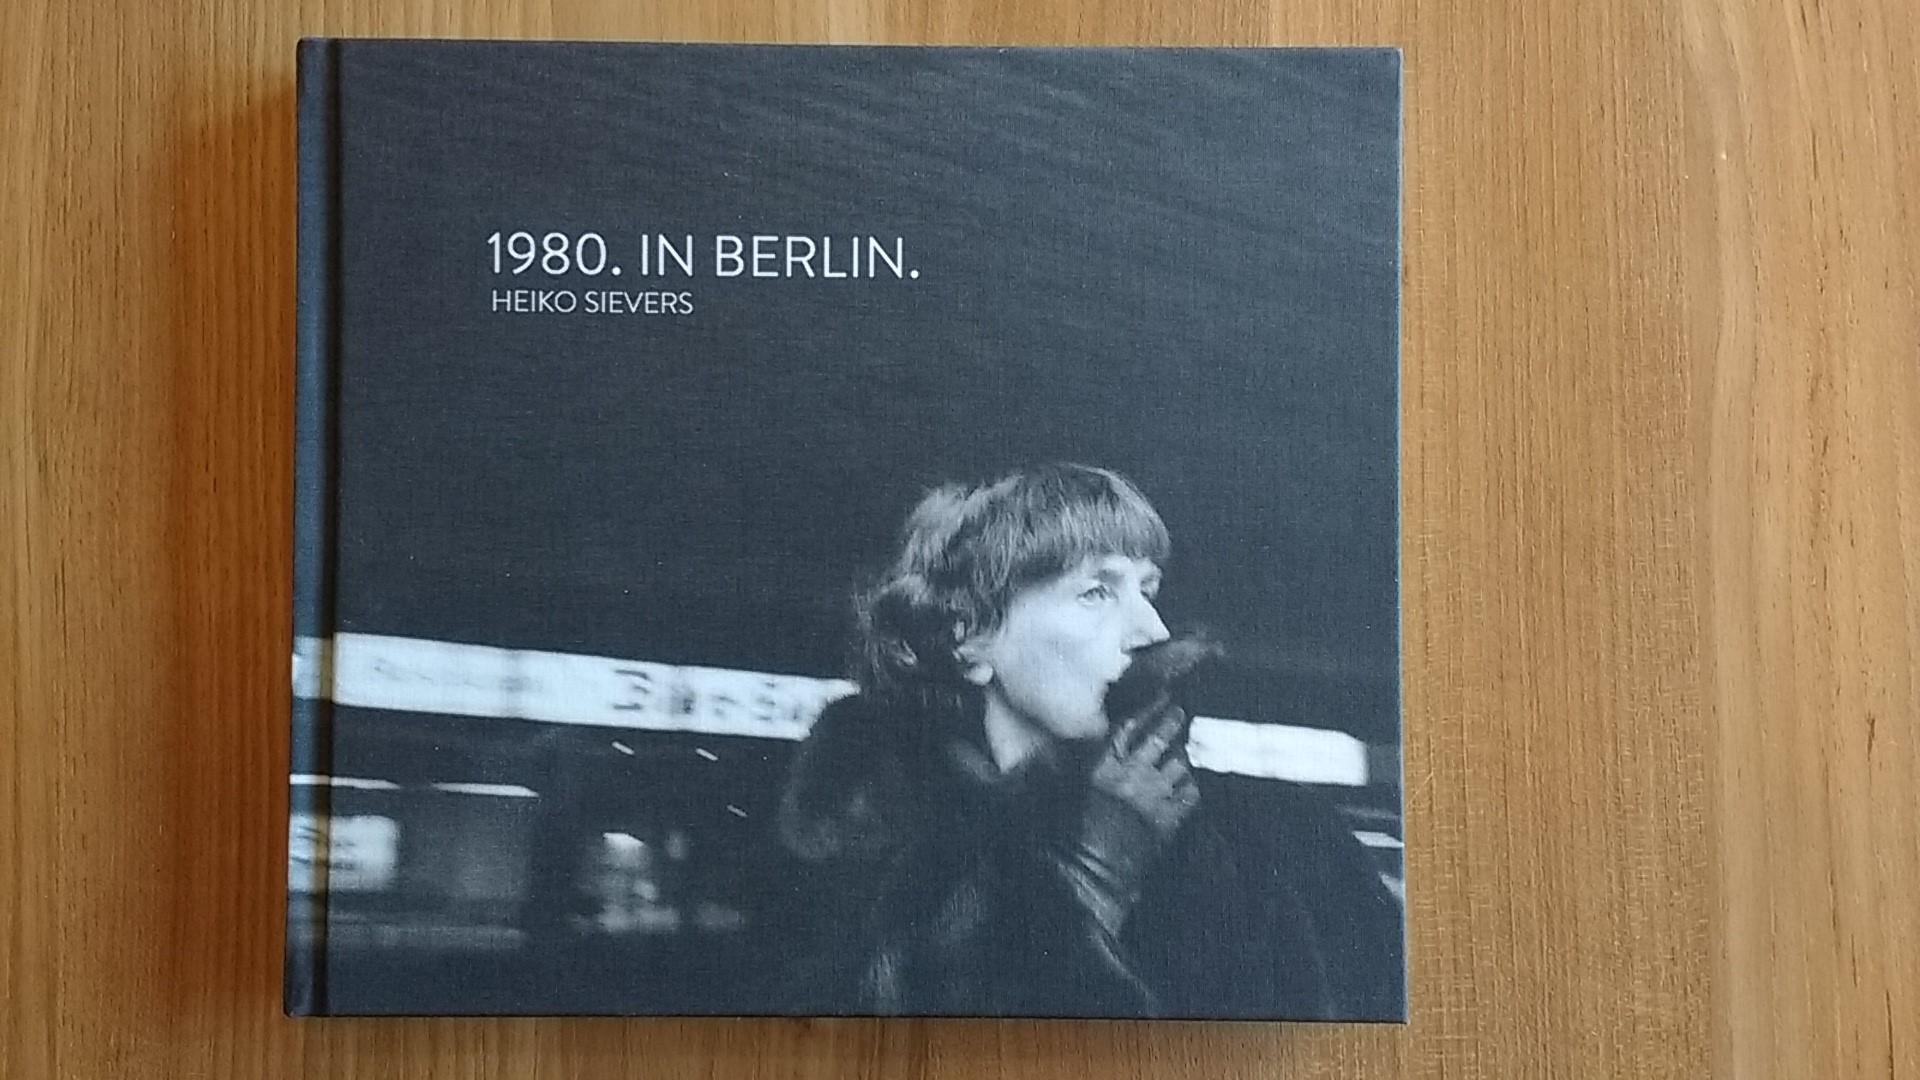 1980. In Berlin. by Heiko Sievers